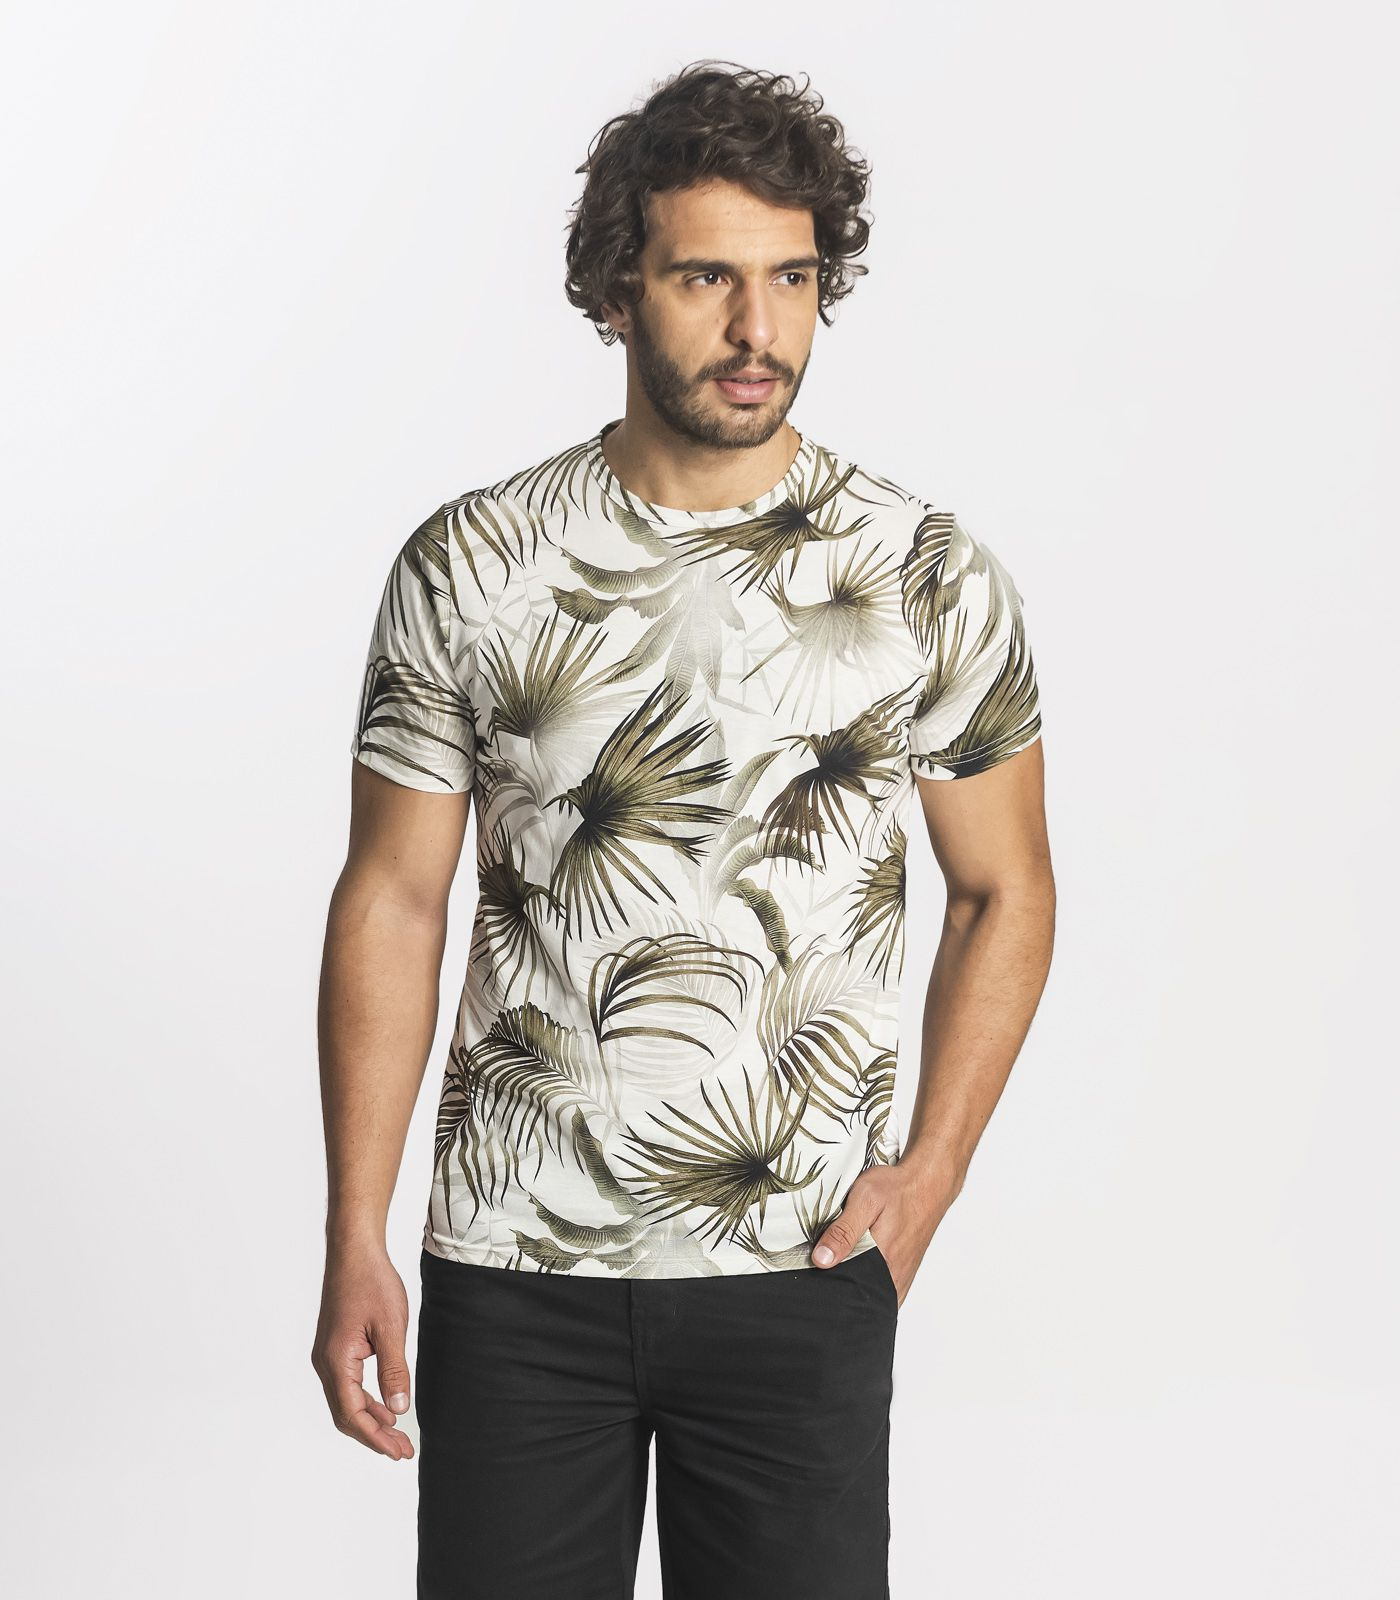 Camiseta Masculina Manga Curta Rovitex 6021025